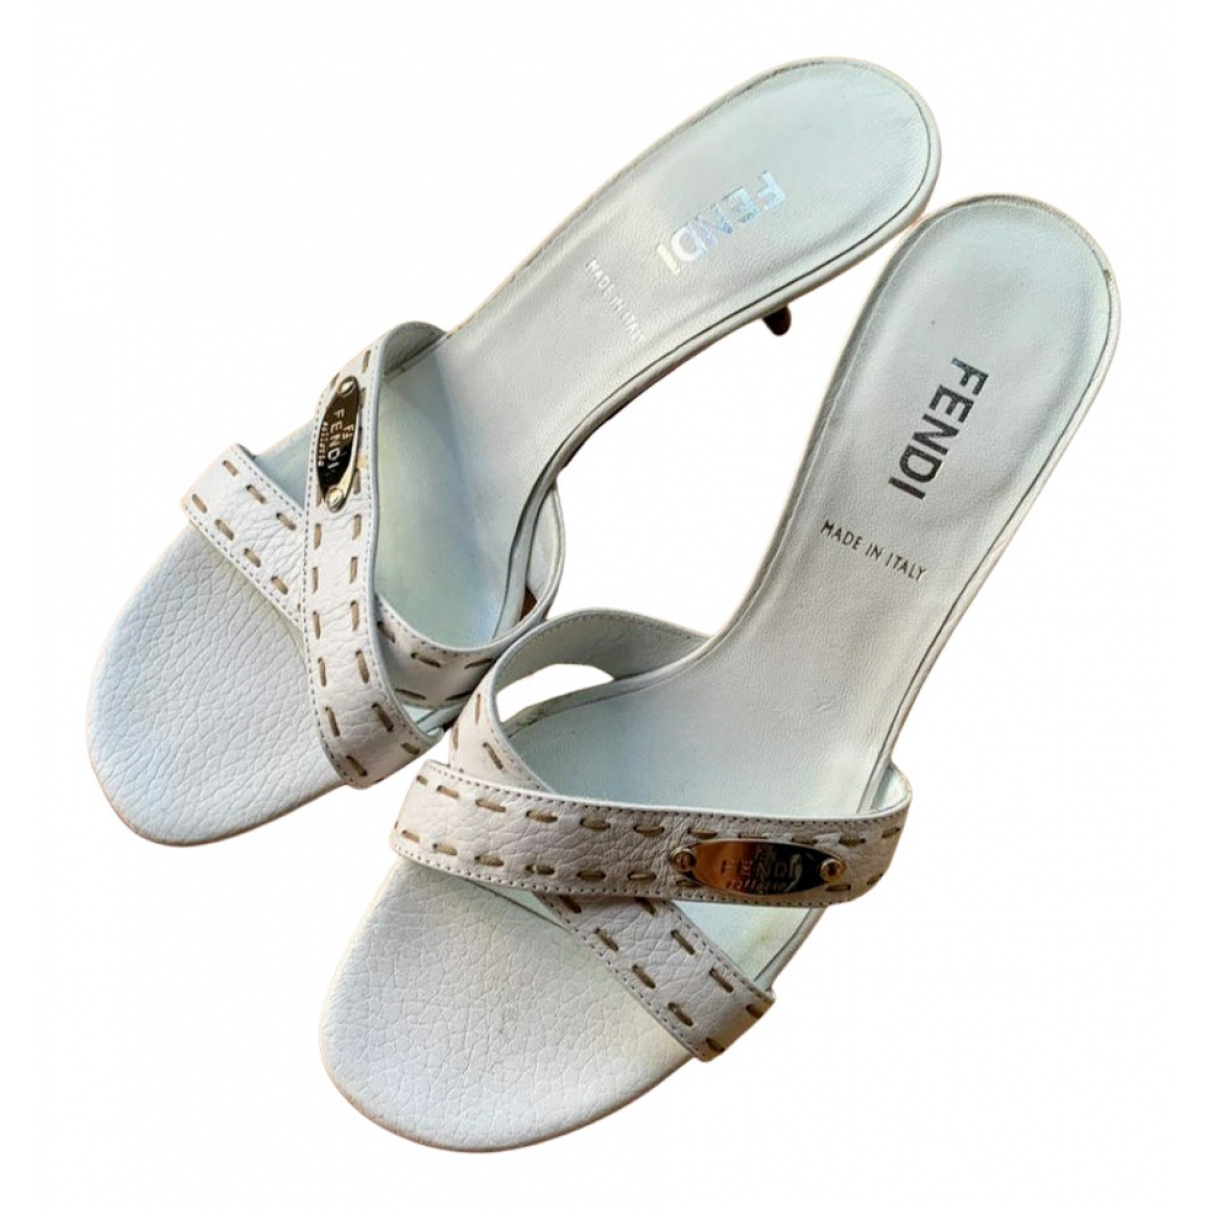 Fendi N White Leather Sandals for Women 35.5 EU